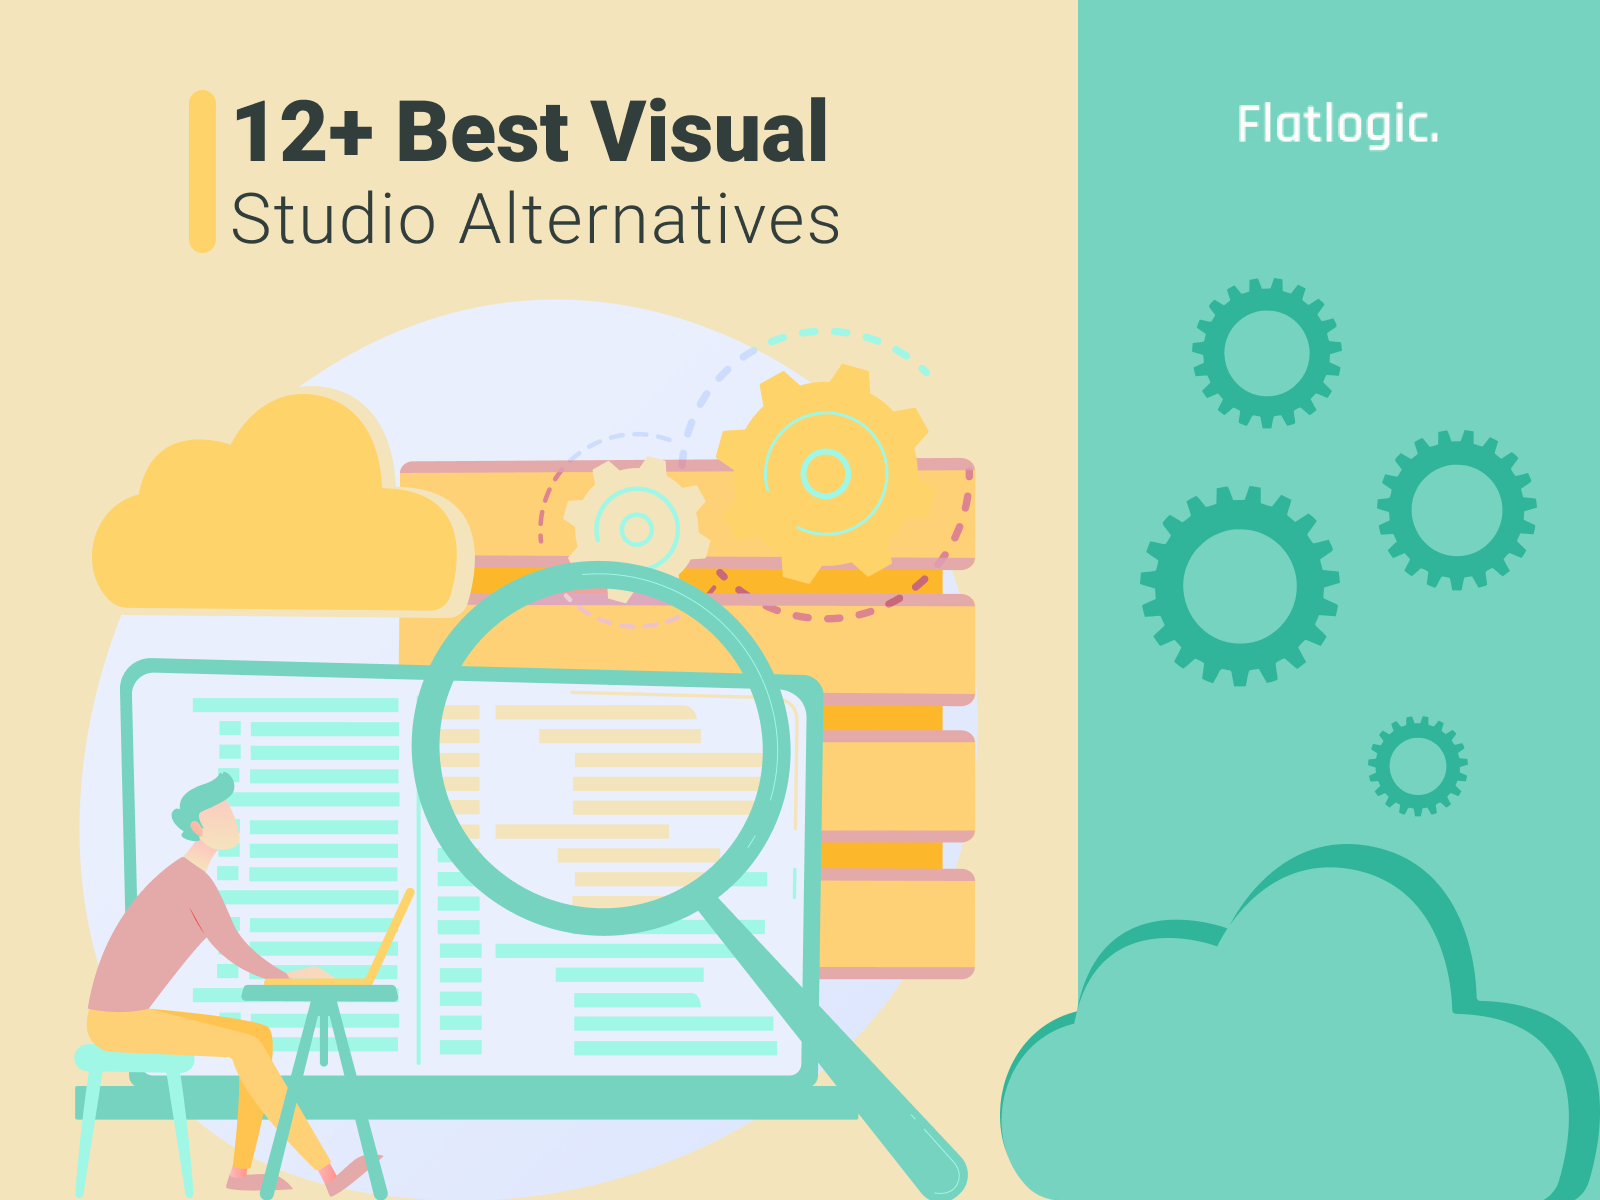 12+ Best Visual Studio Alternatives